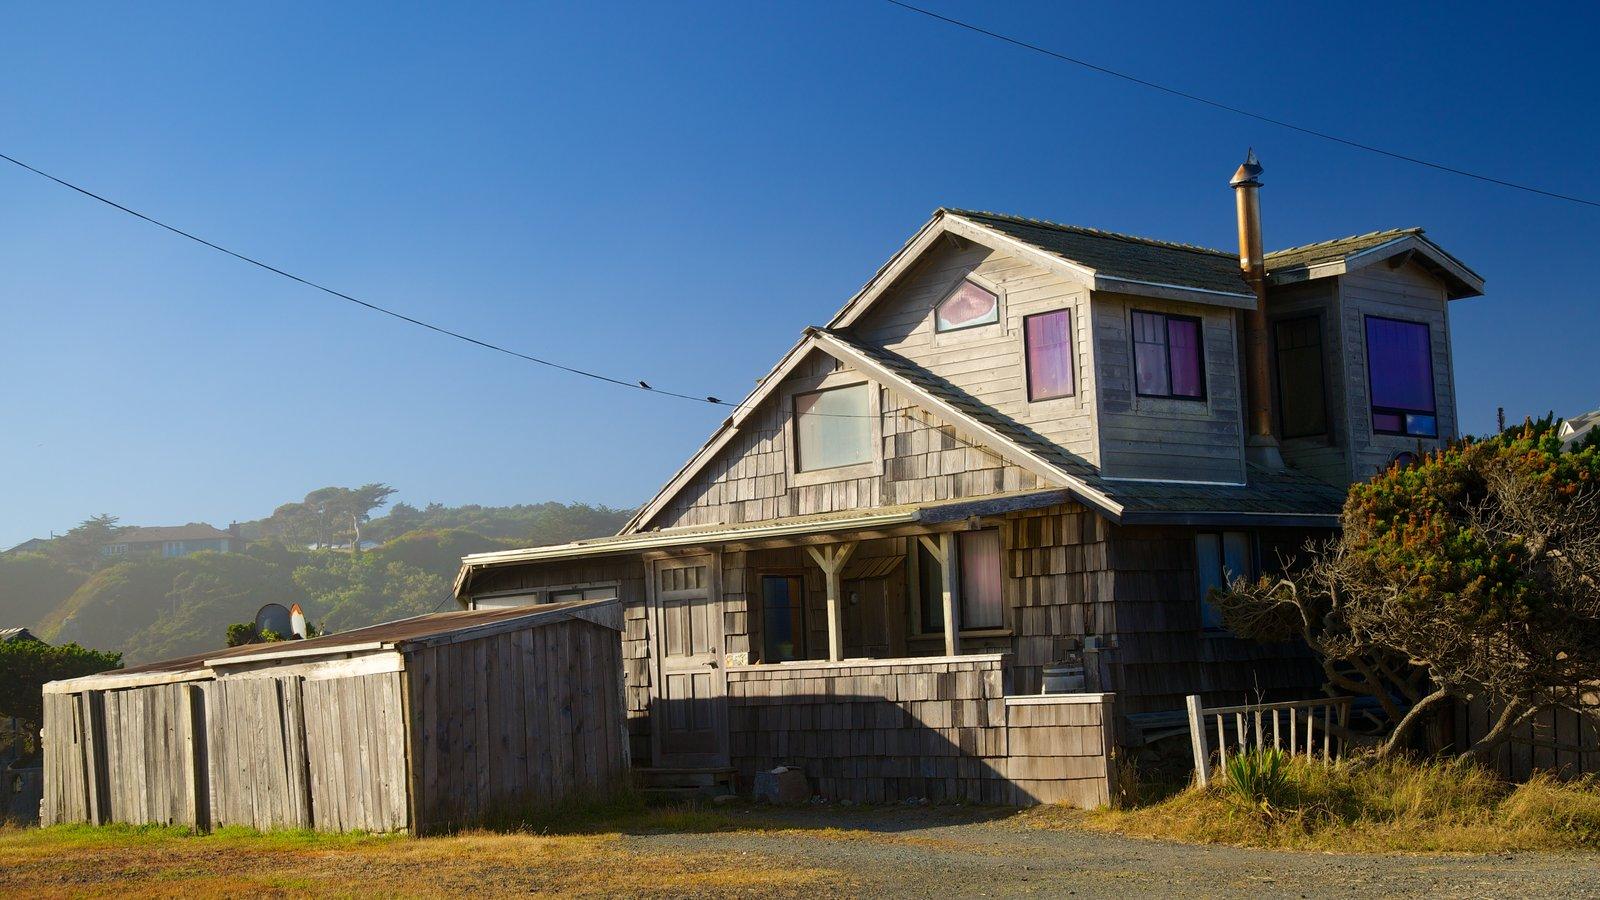 Bandon caracterizando uma casa